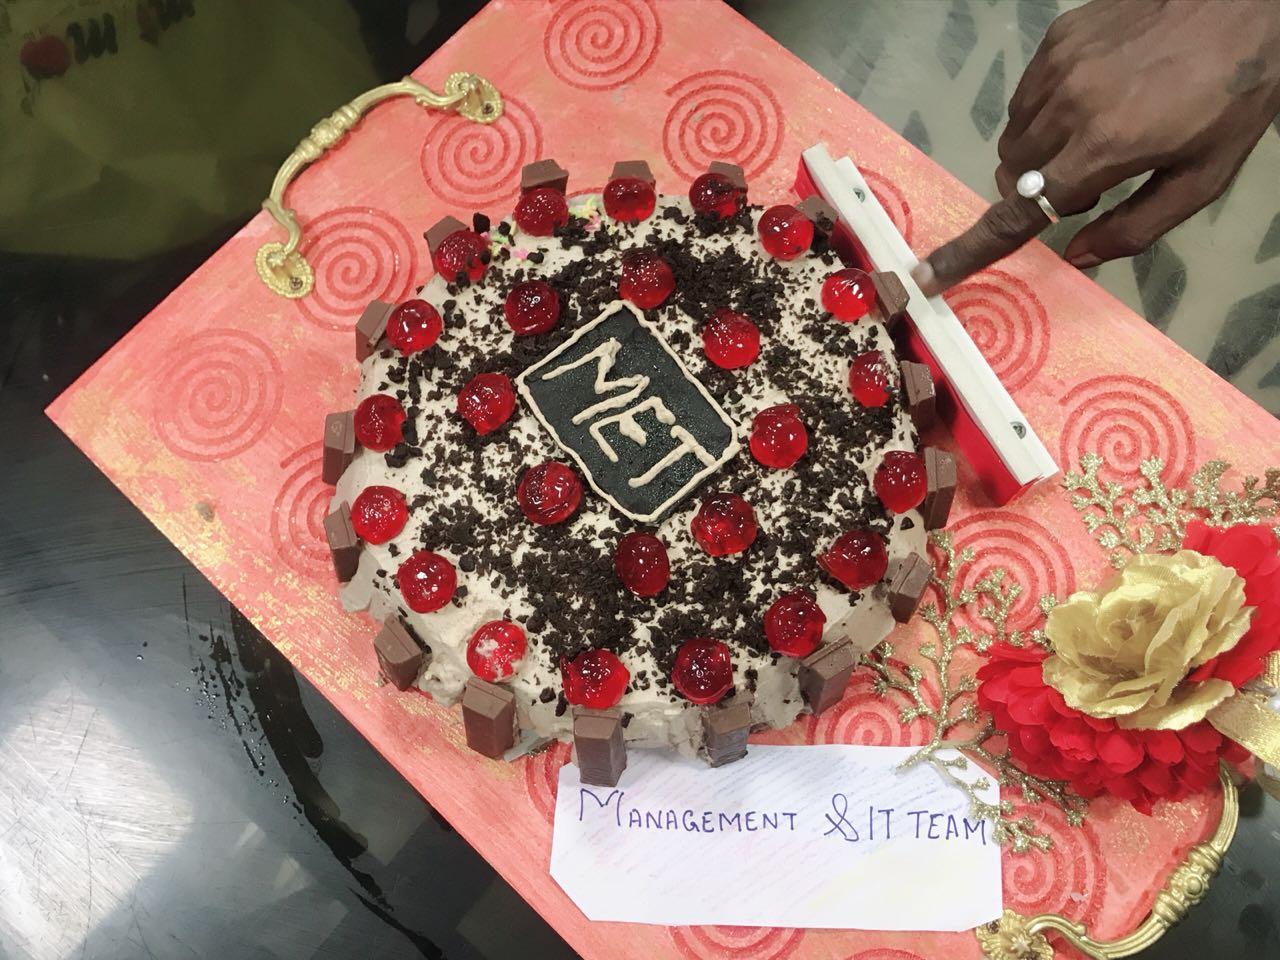 Bake The Cake 12